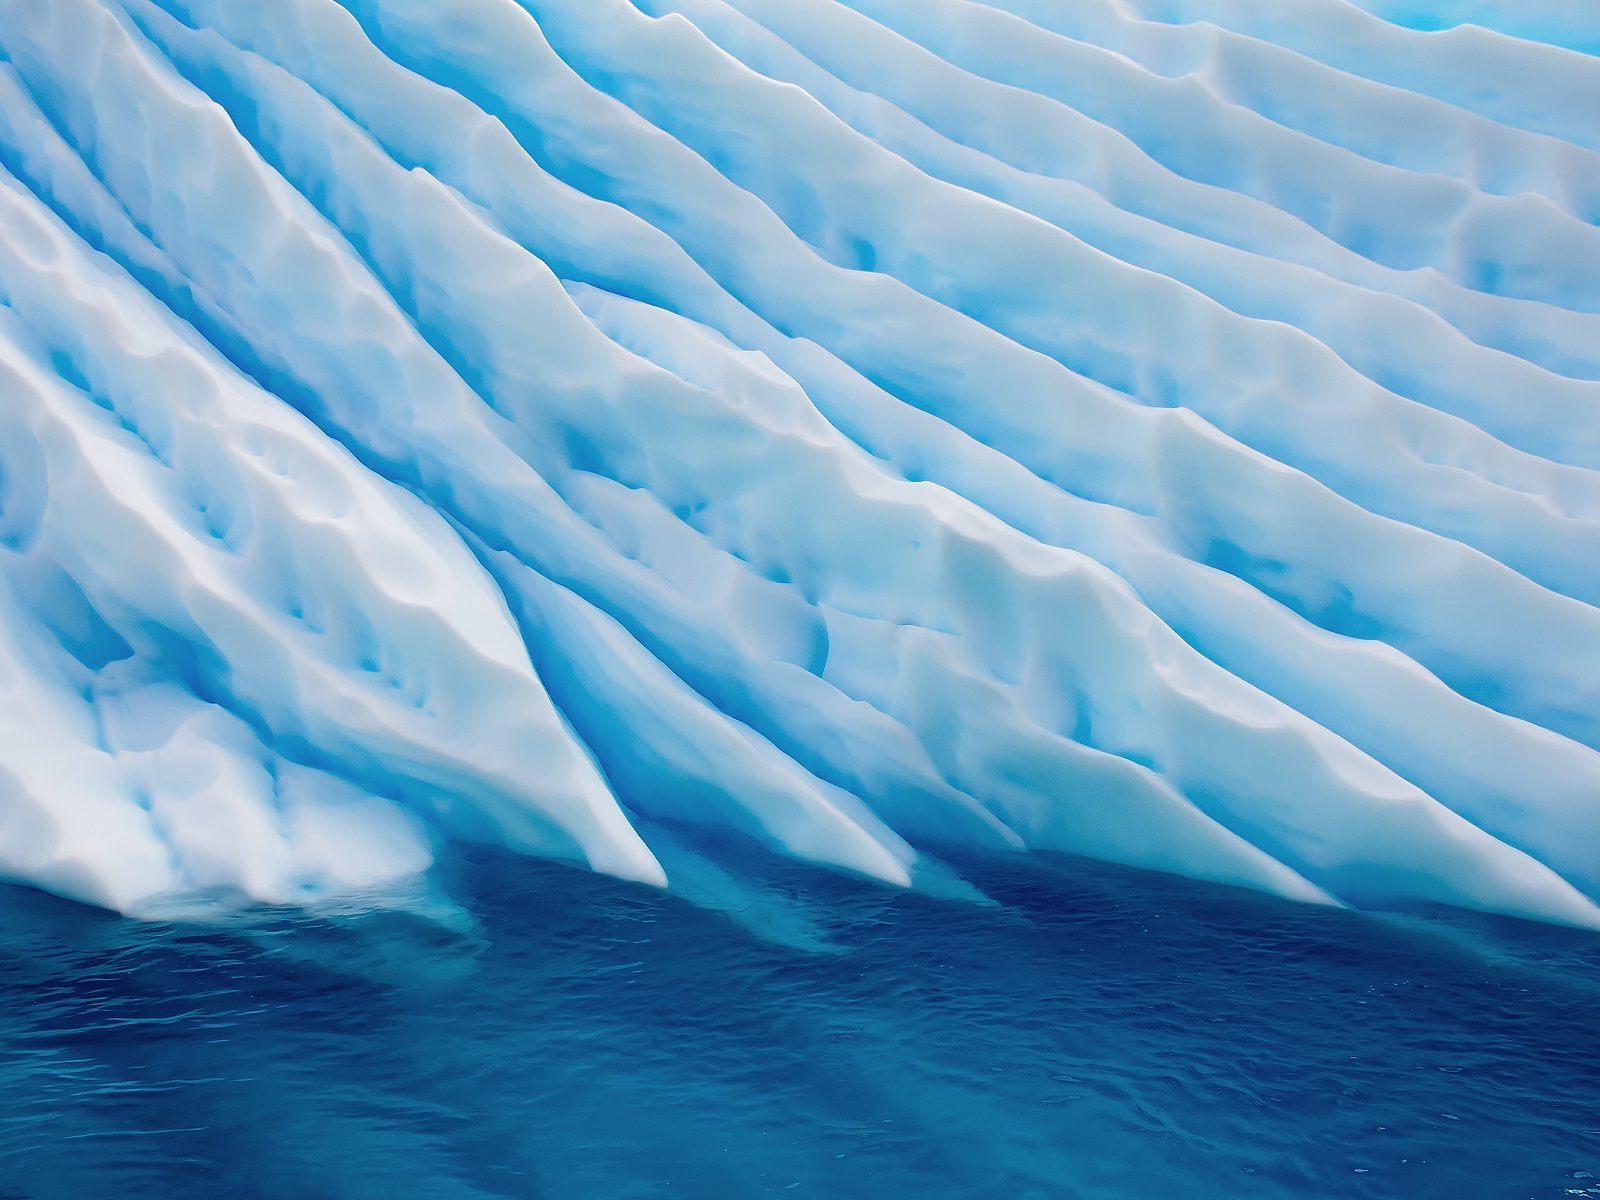 Ice Glacier Wallpaper Hd Wallpaper Background